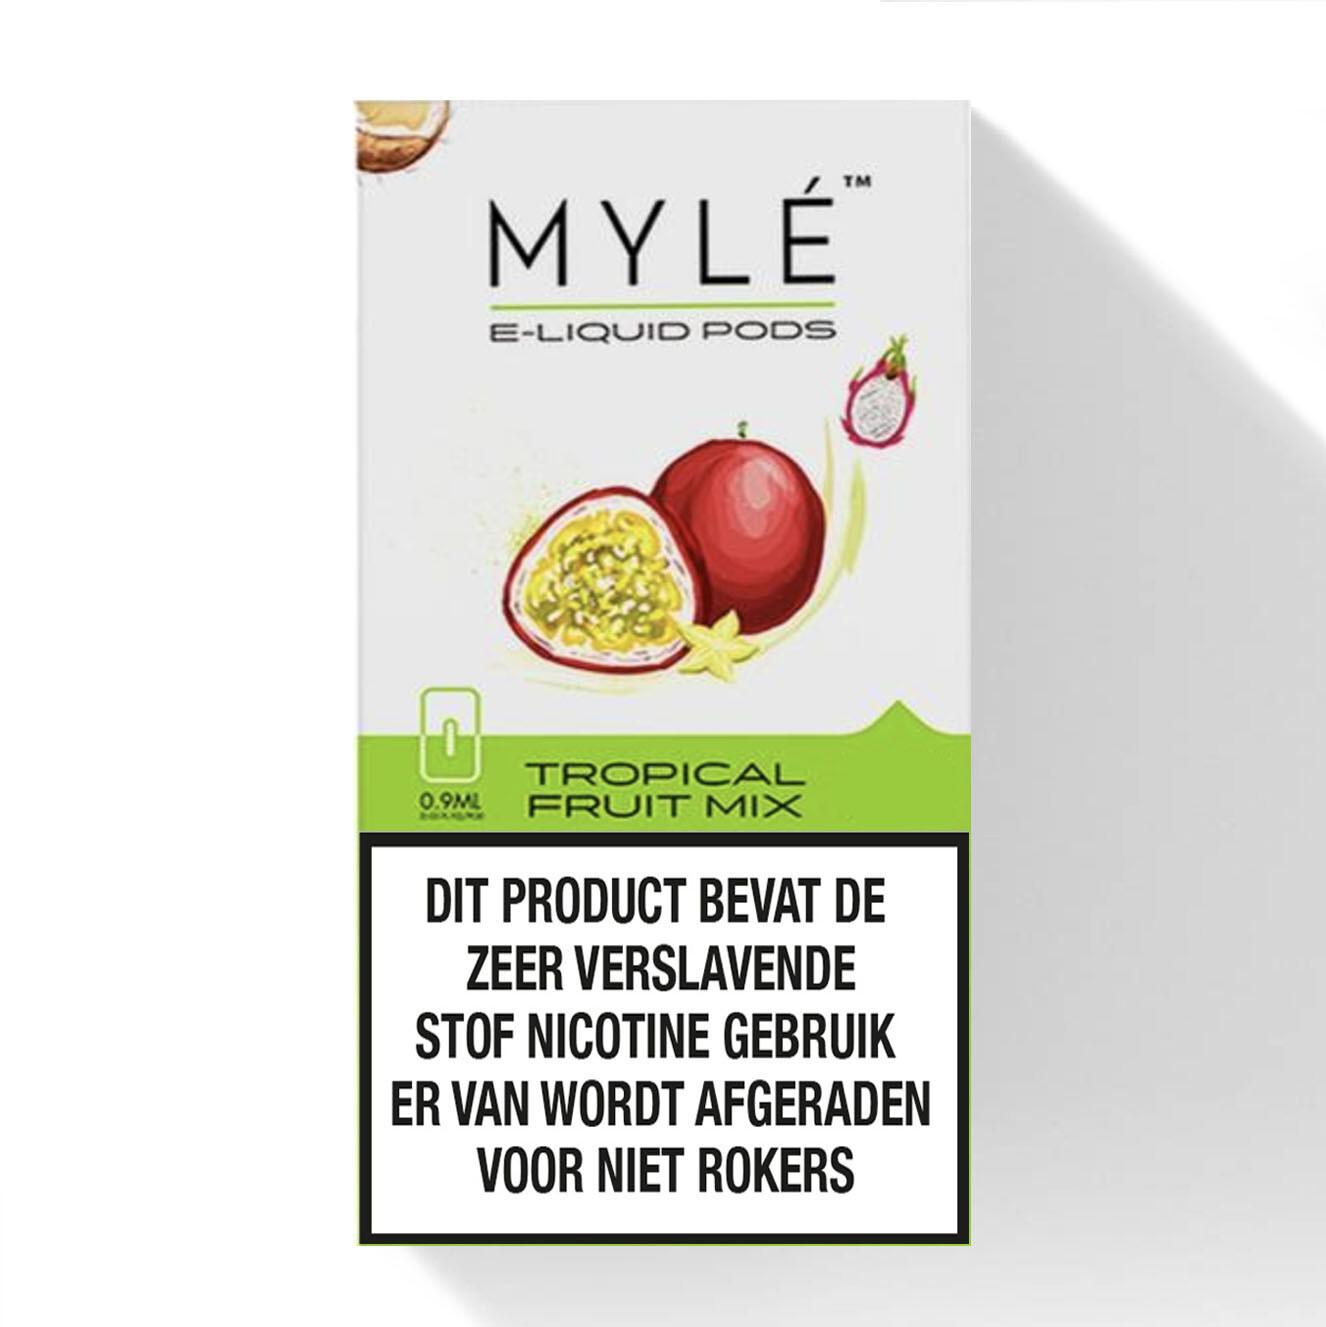 Myle Tropical Fruit Mix Replacement Pods - 50MG - بودات فواكه استوائية لجهاز سحبة السيجارة مايلي